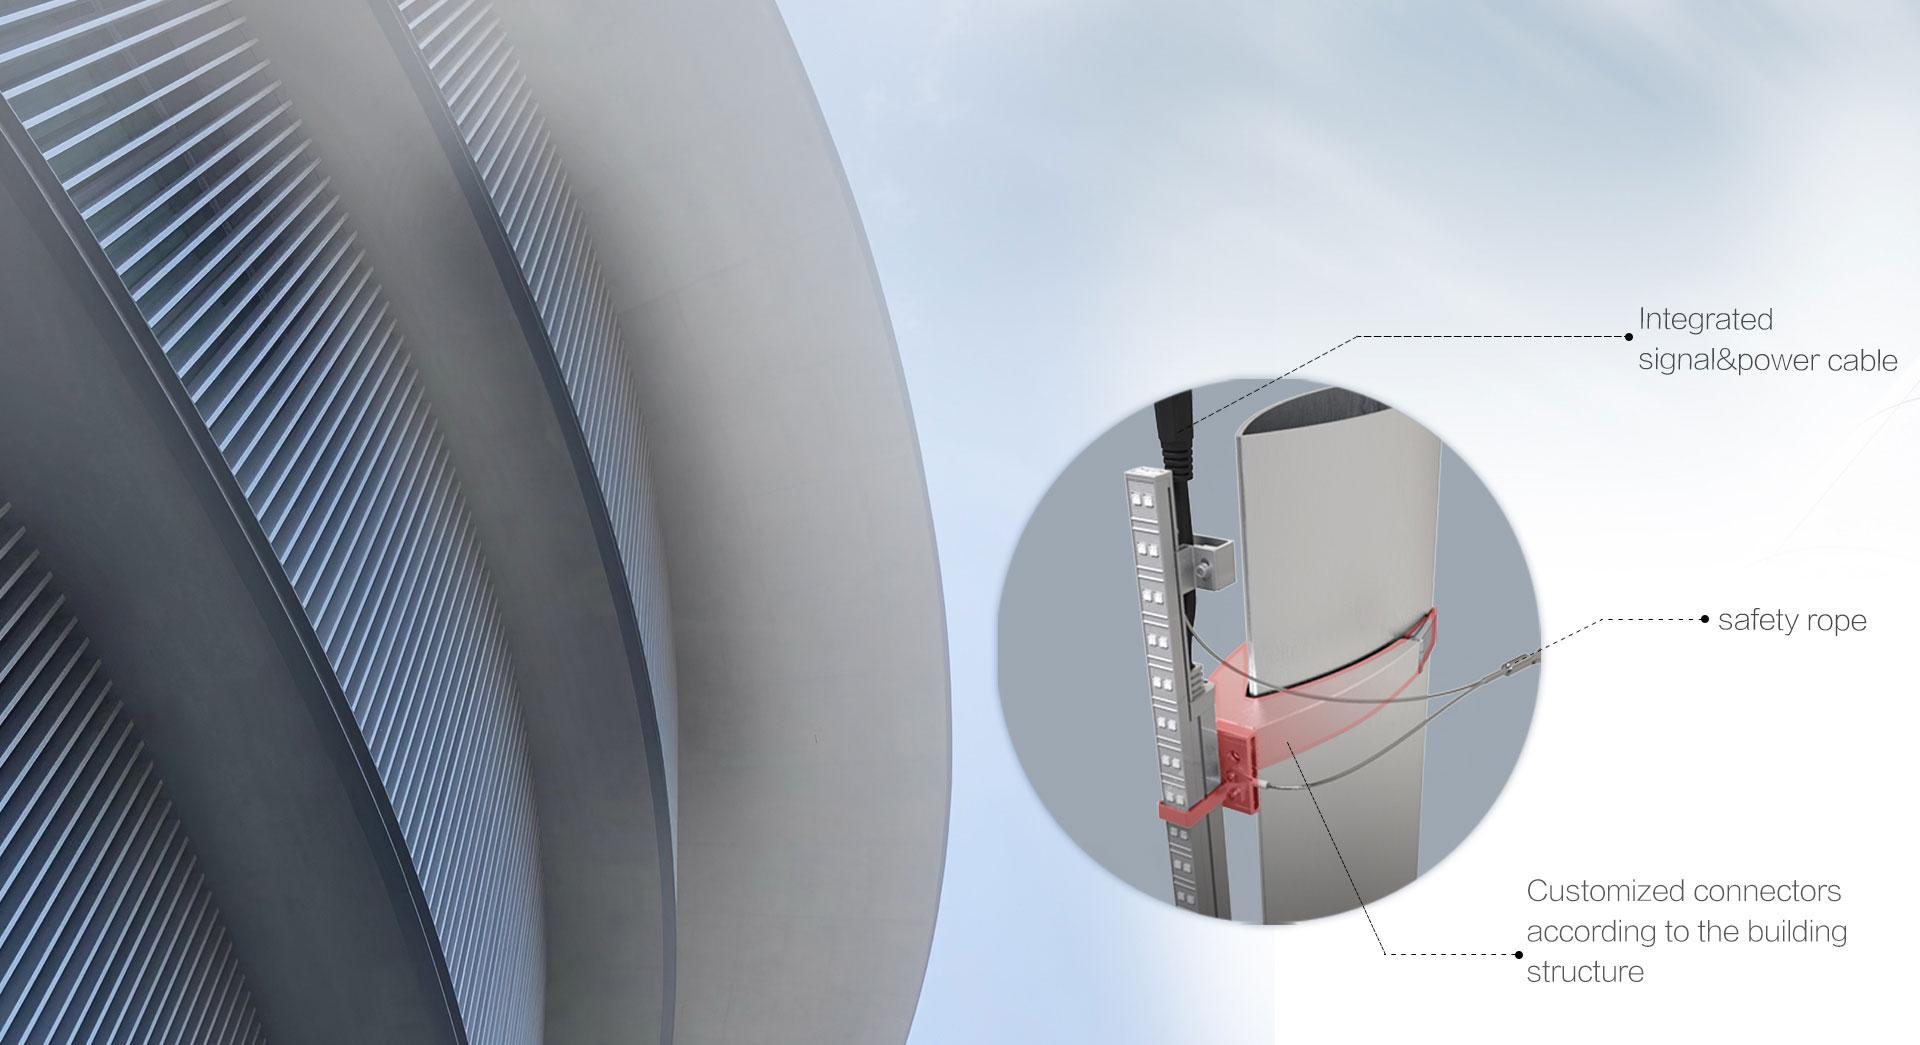 No steel structure, Easy installation & maintenance